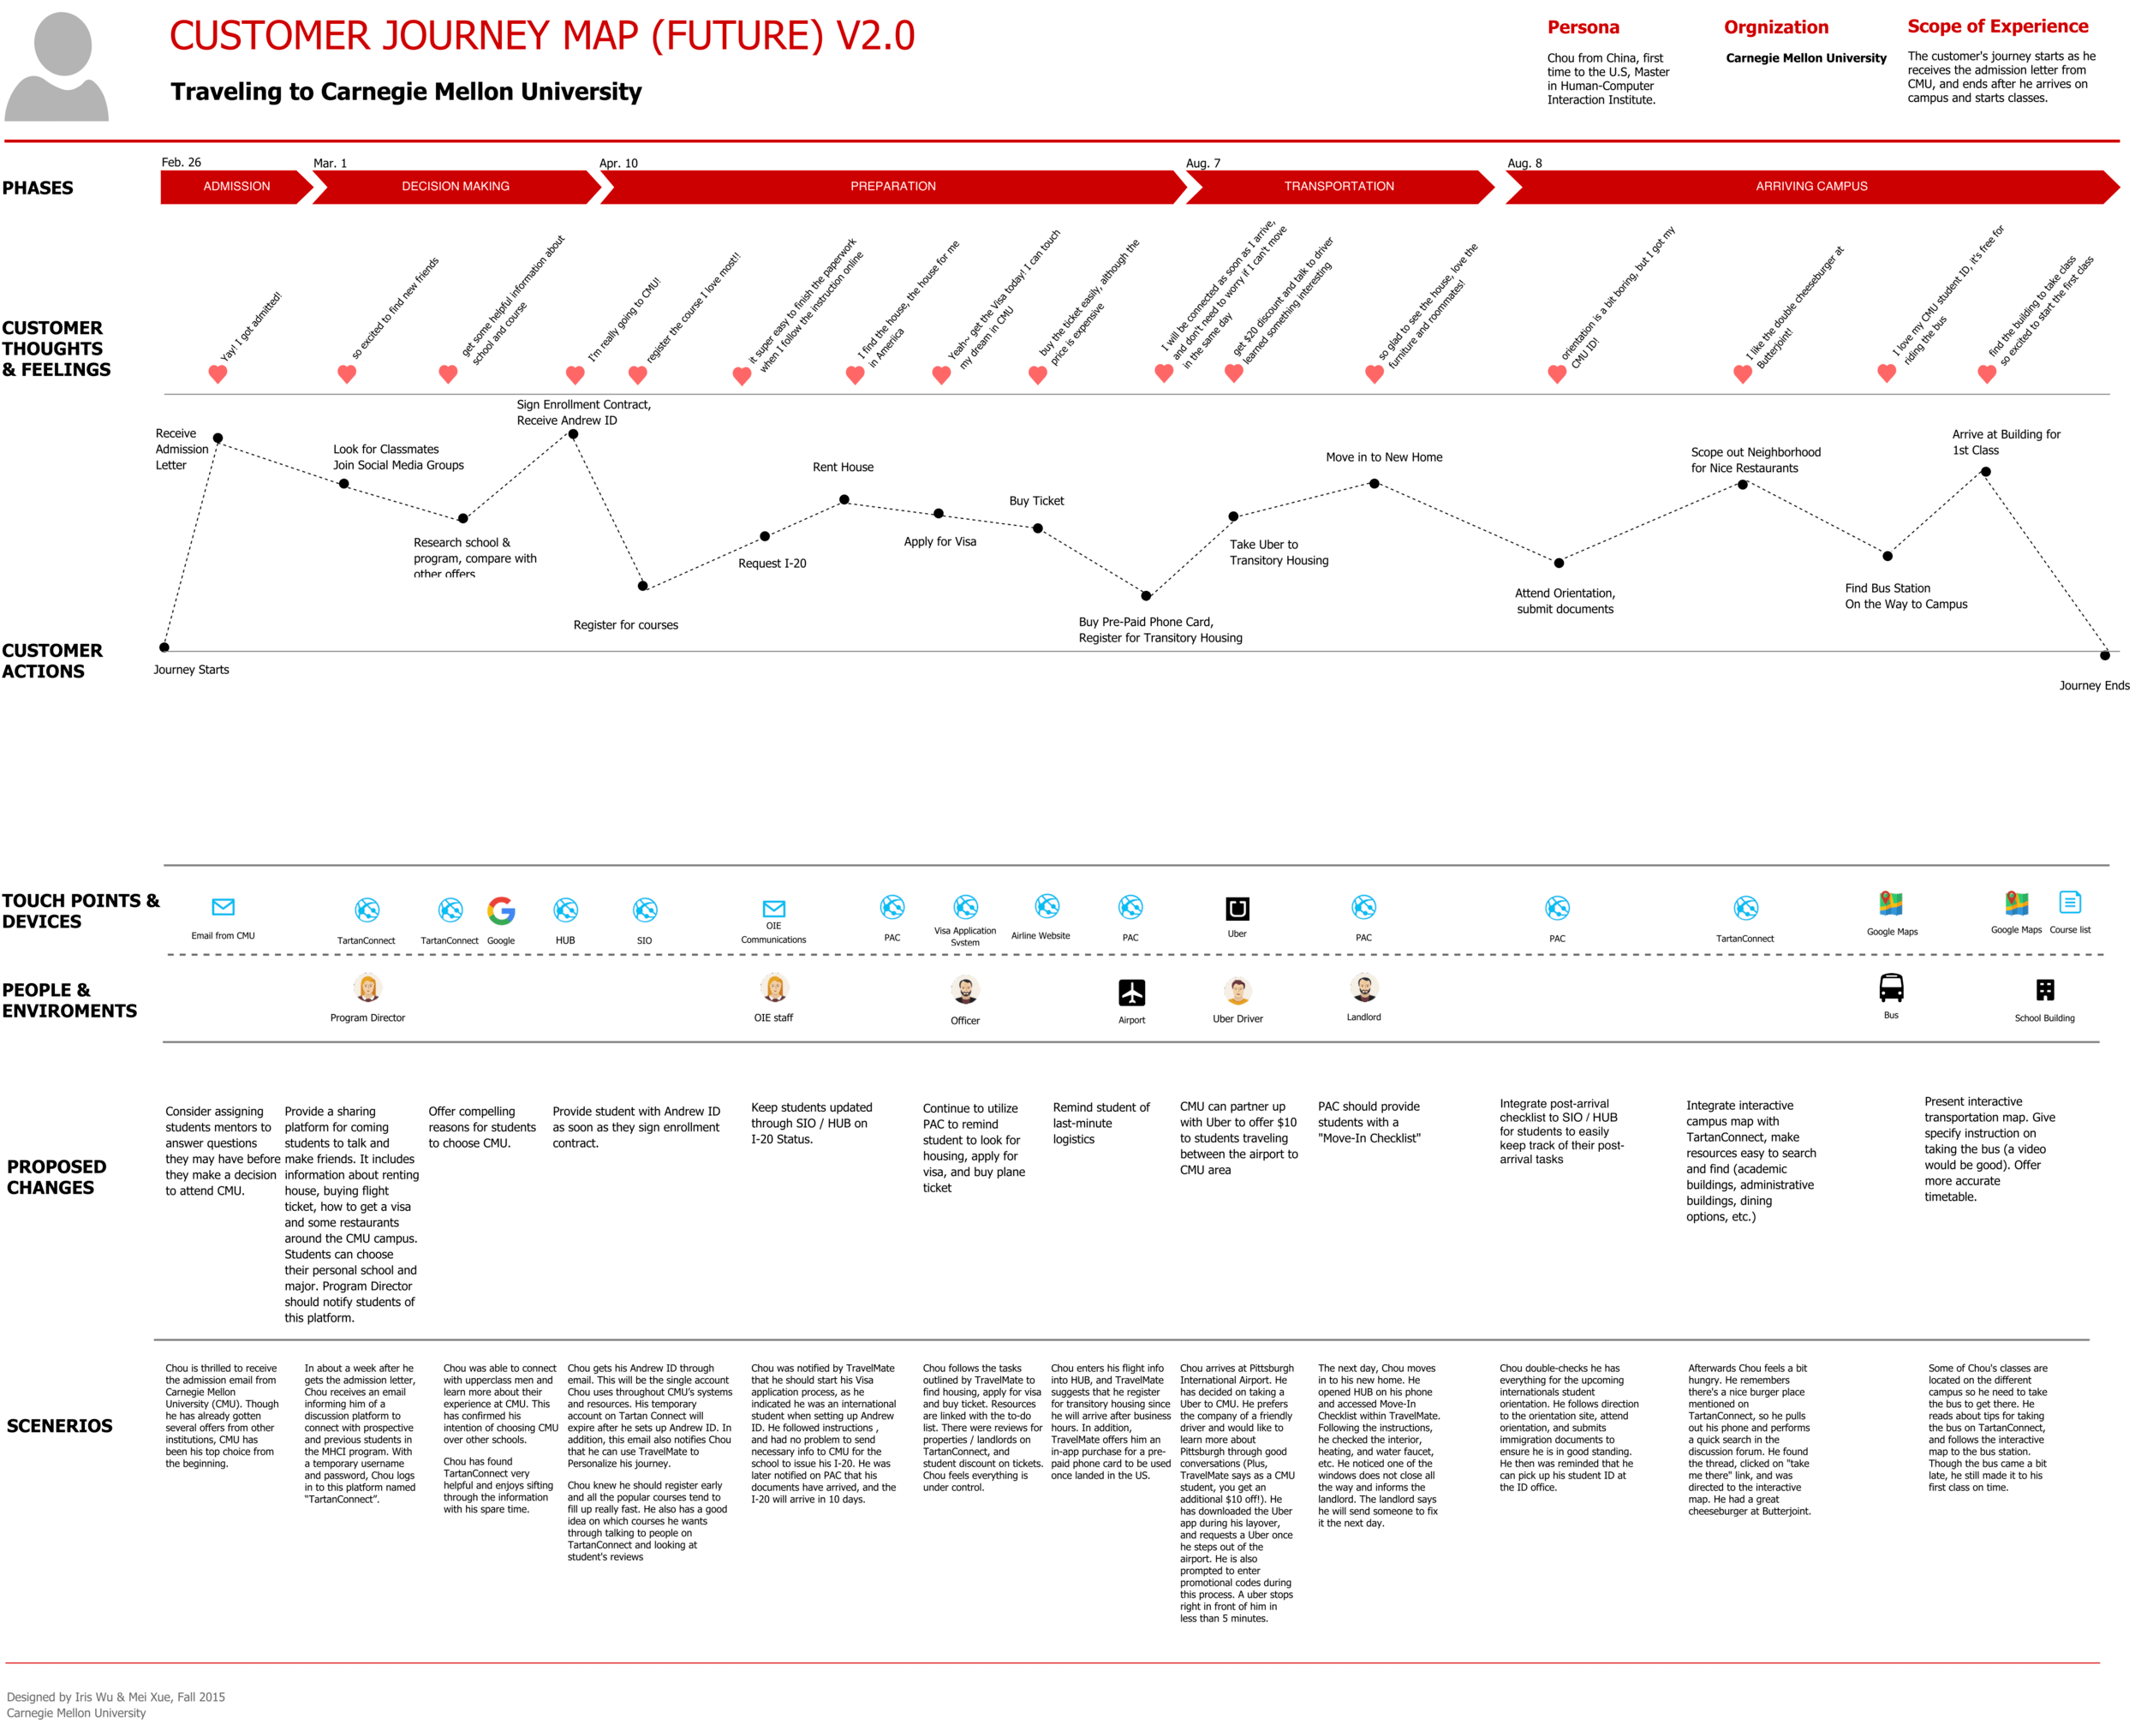 carnegie mellon university customer journey map future example